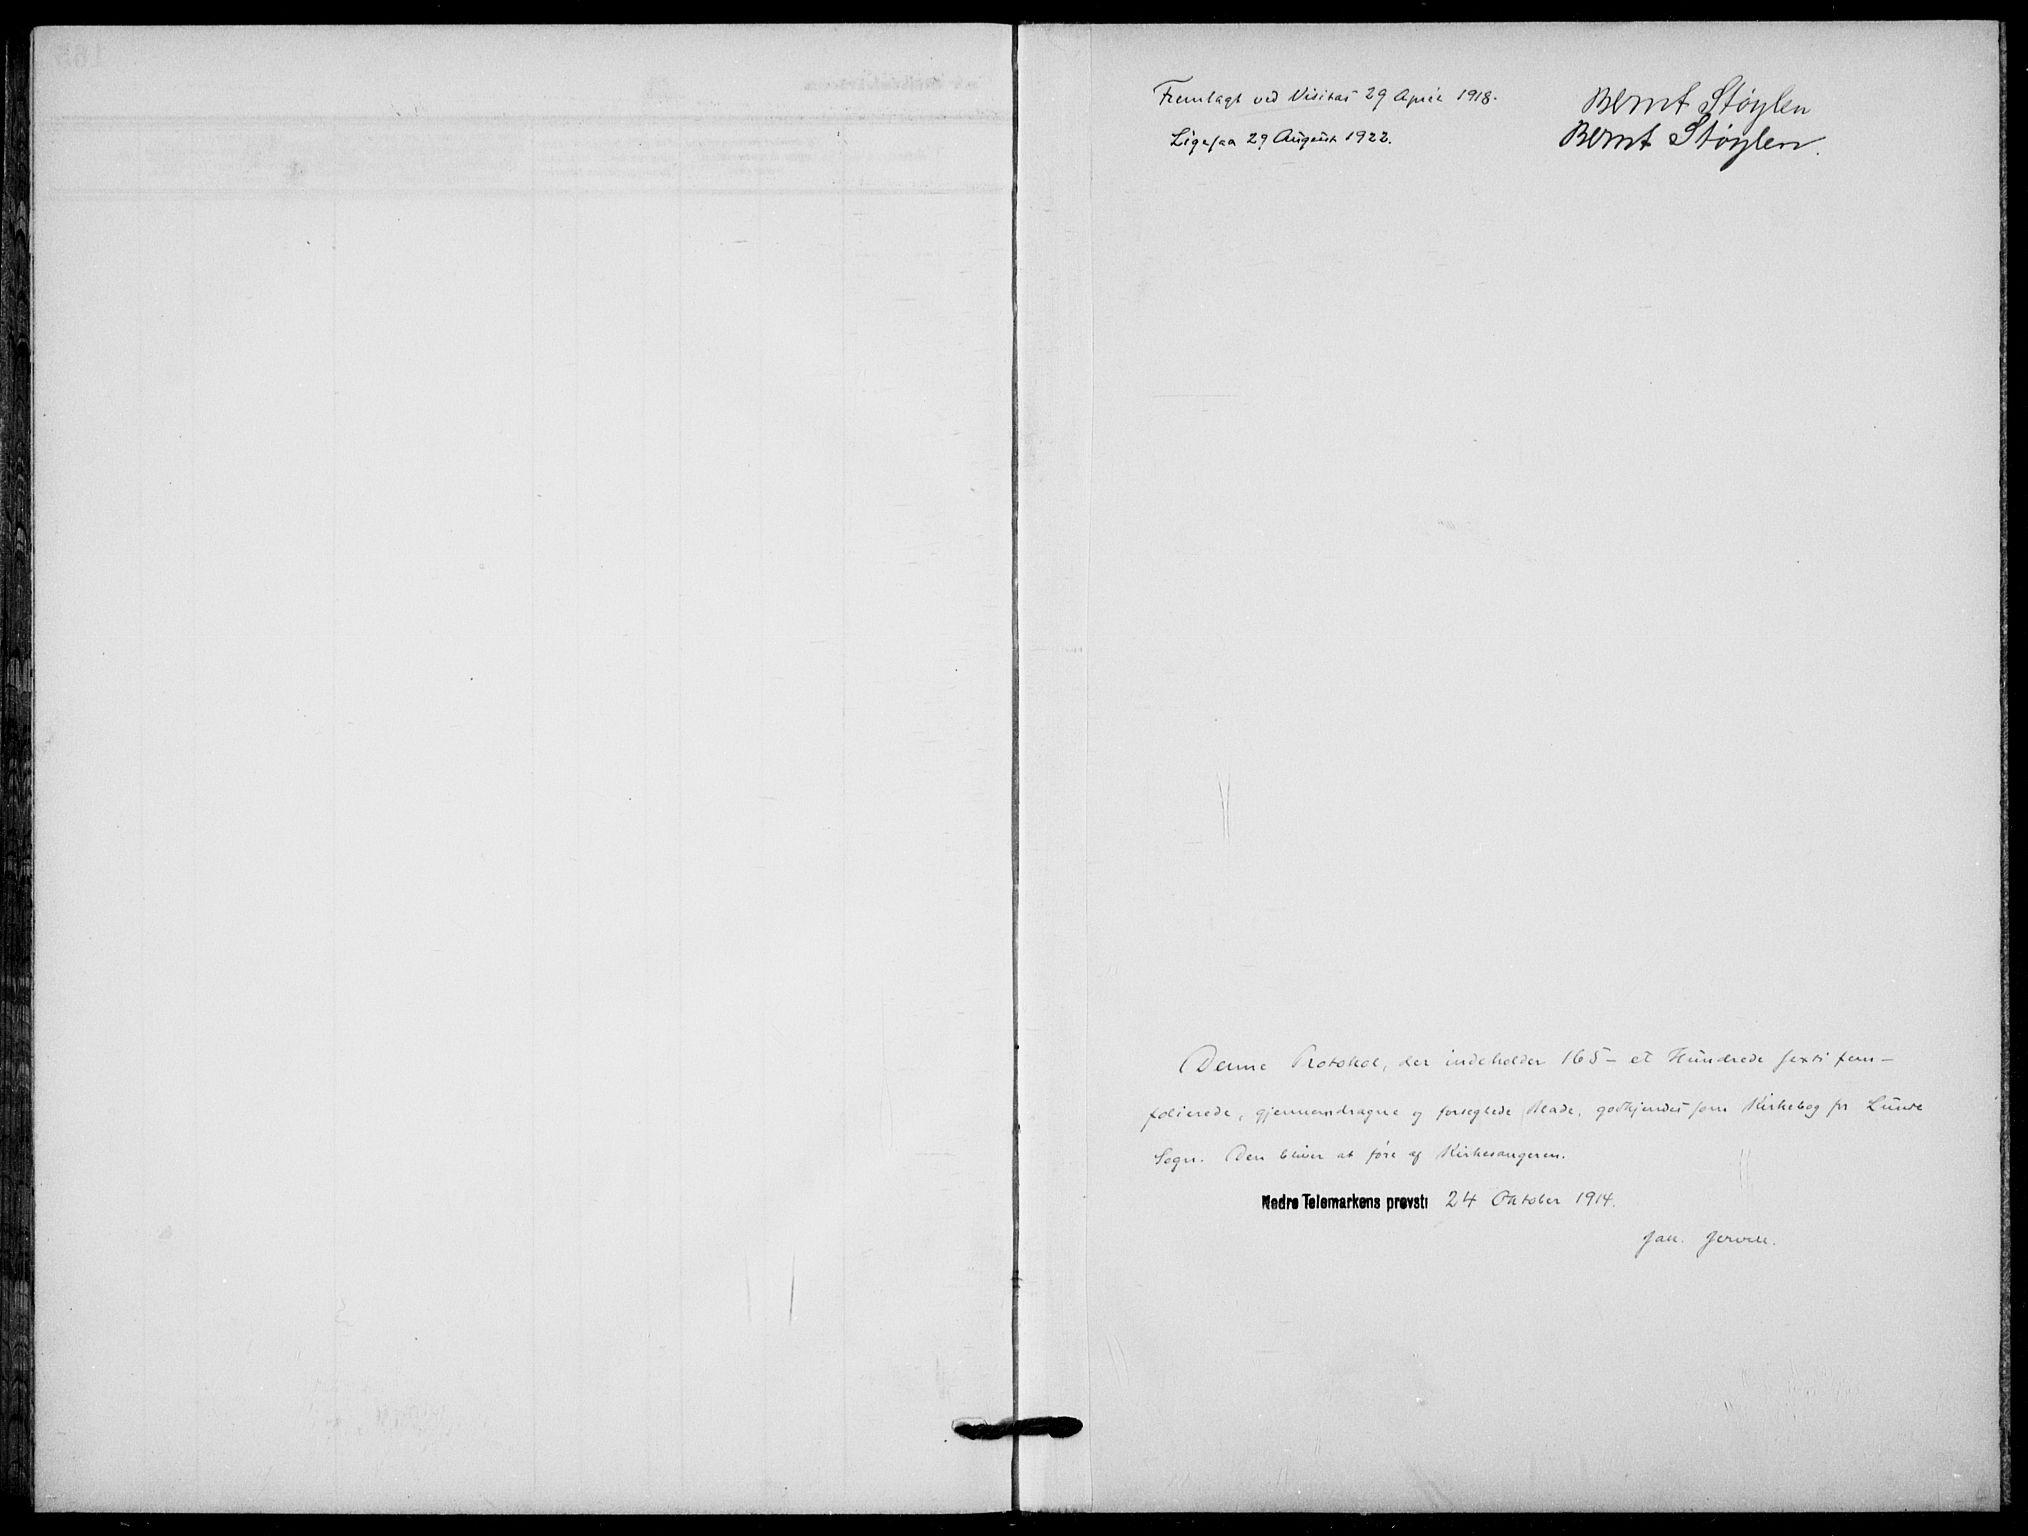 SAKO, Lunde kirkebøker, F/Fa/L0005: Ministerialbok nr. I 5, 1914-1922